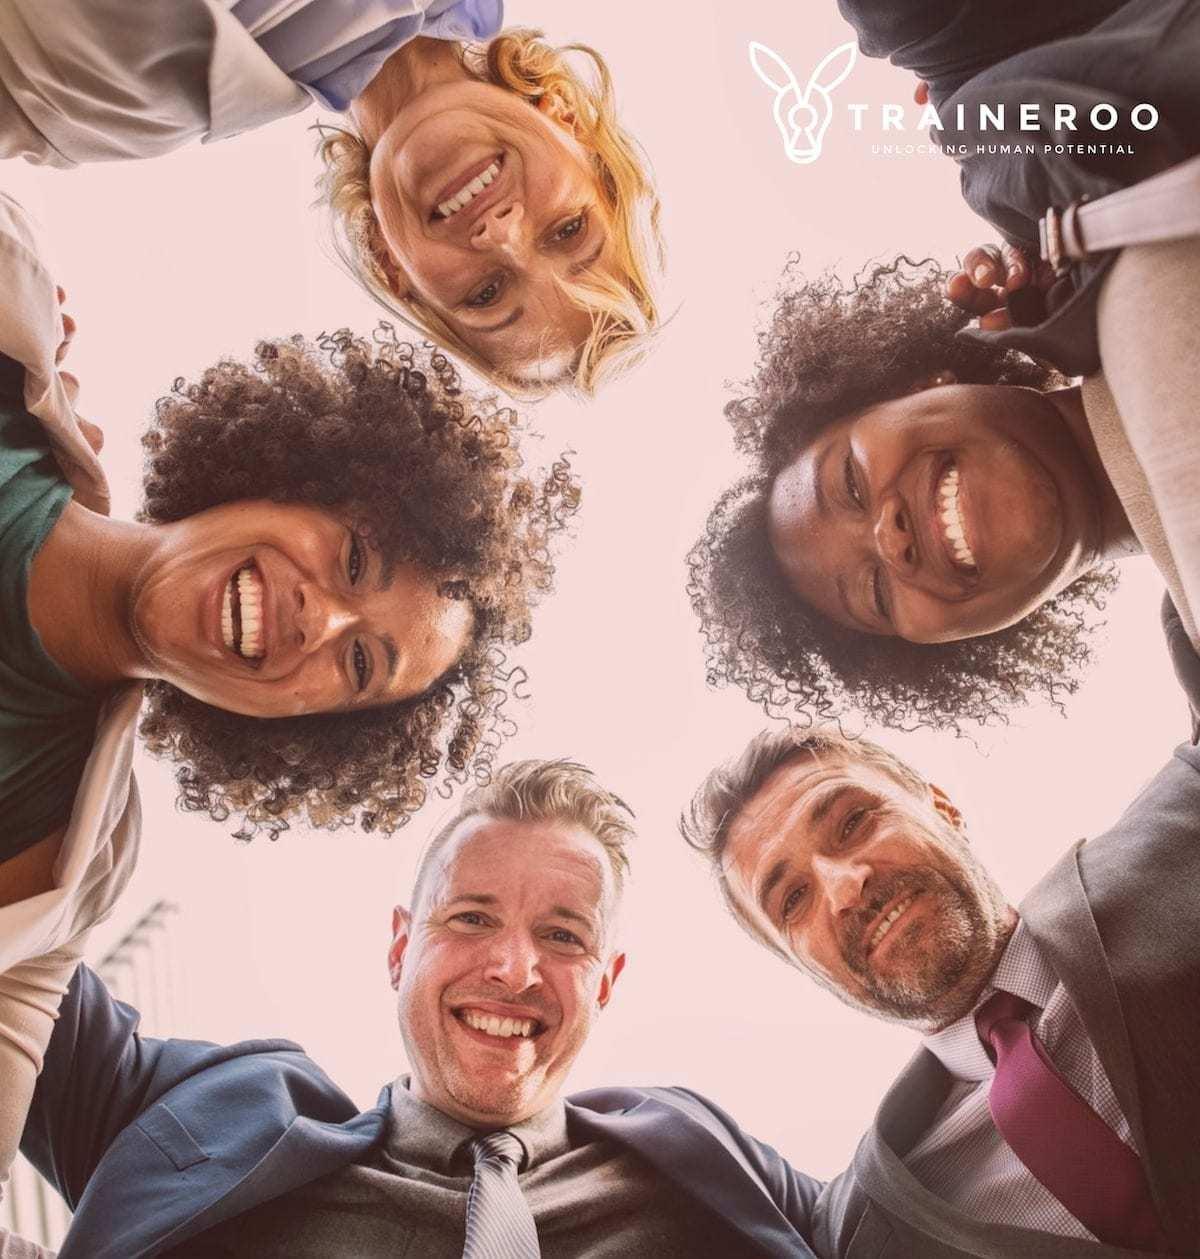 Teamcoaching - Samenwerking Team Coaching Traineroo